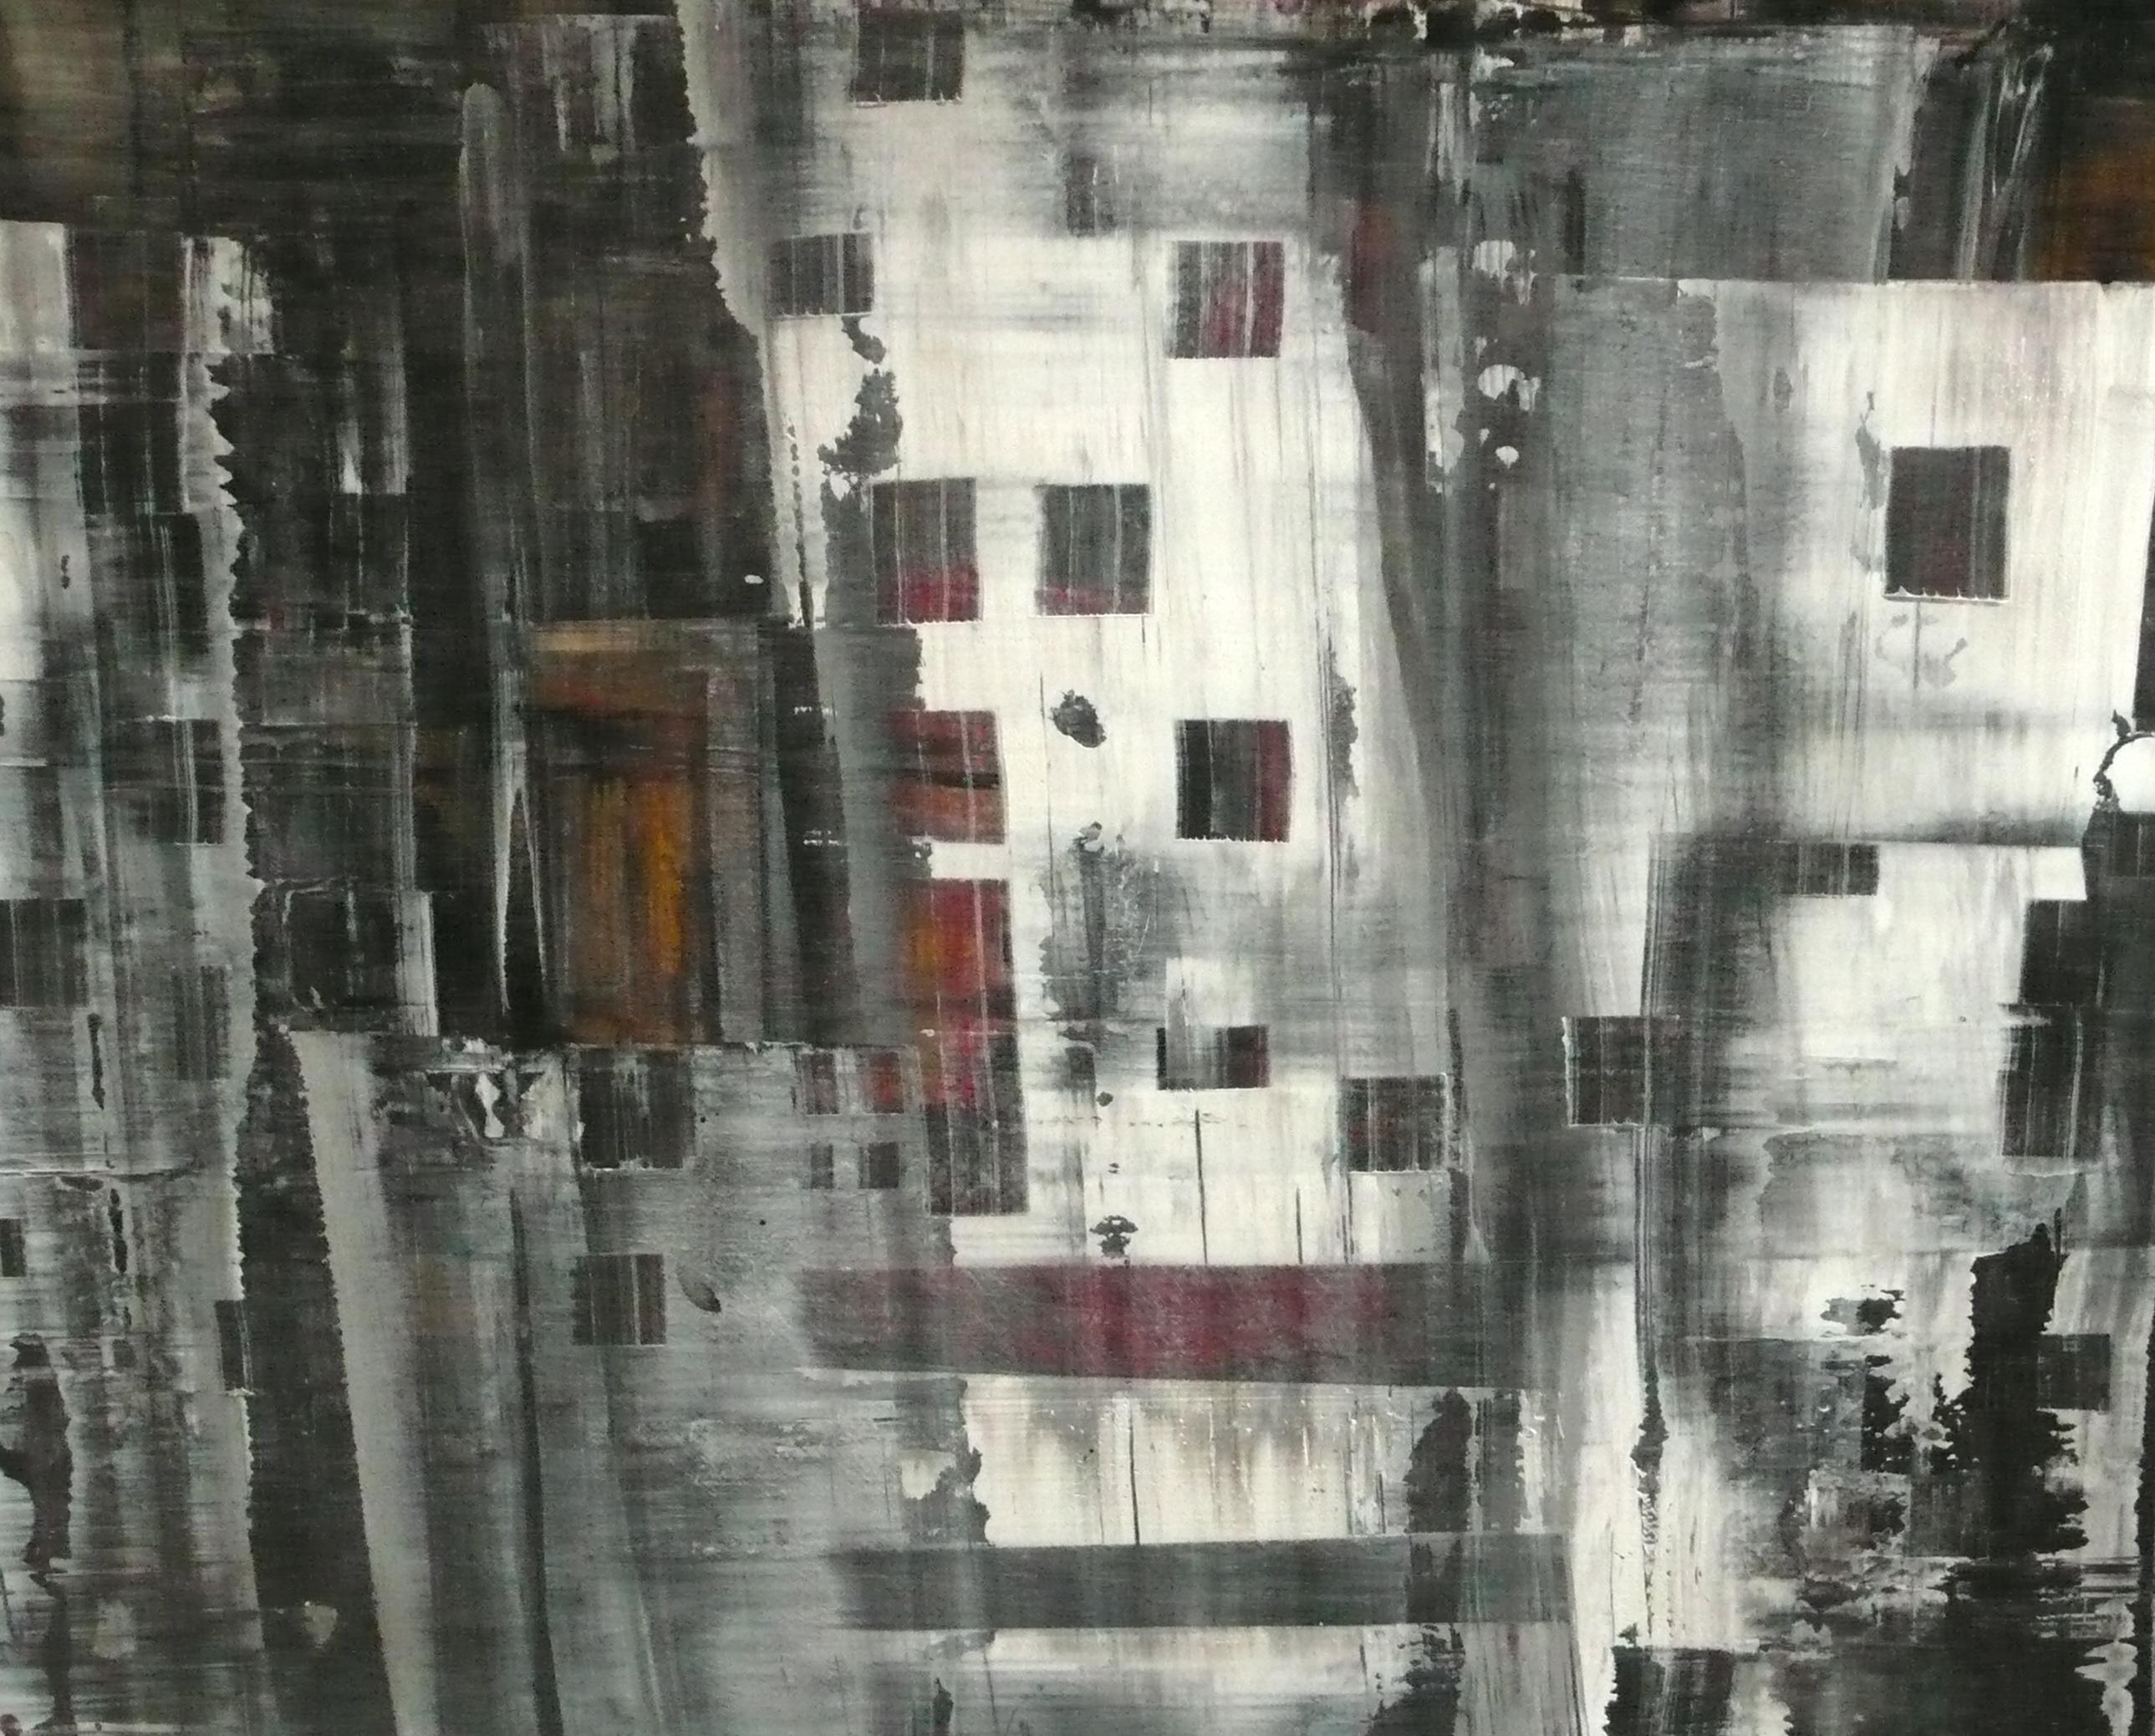 Profondeur l90xh8o g rard perrotin artiste peintre - Peinture effet profondeur ...